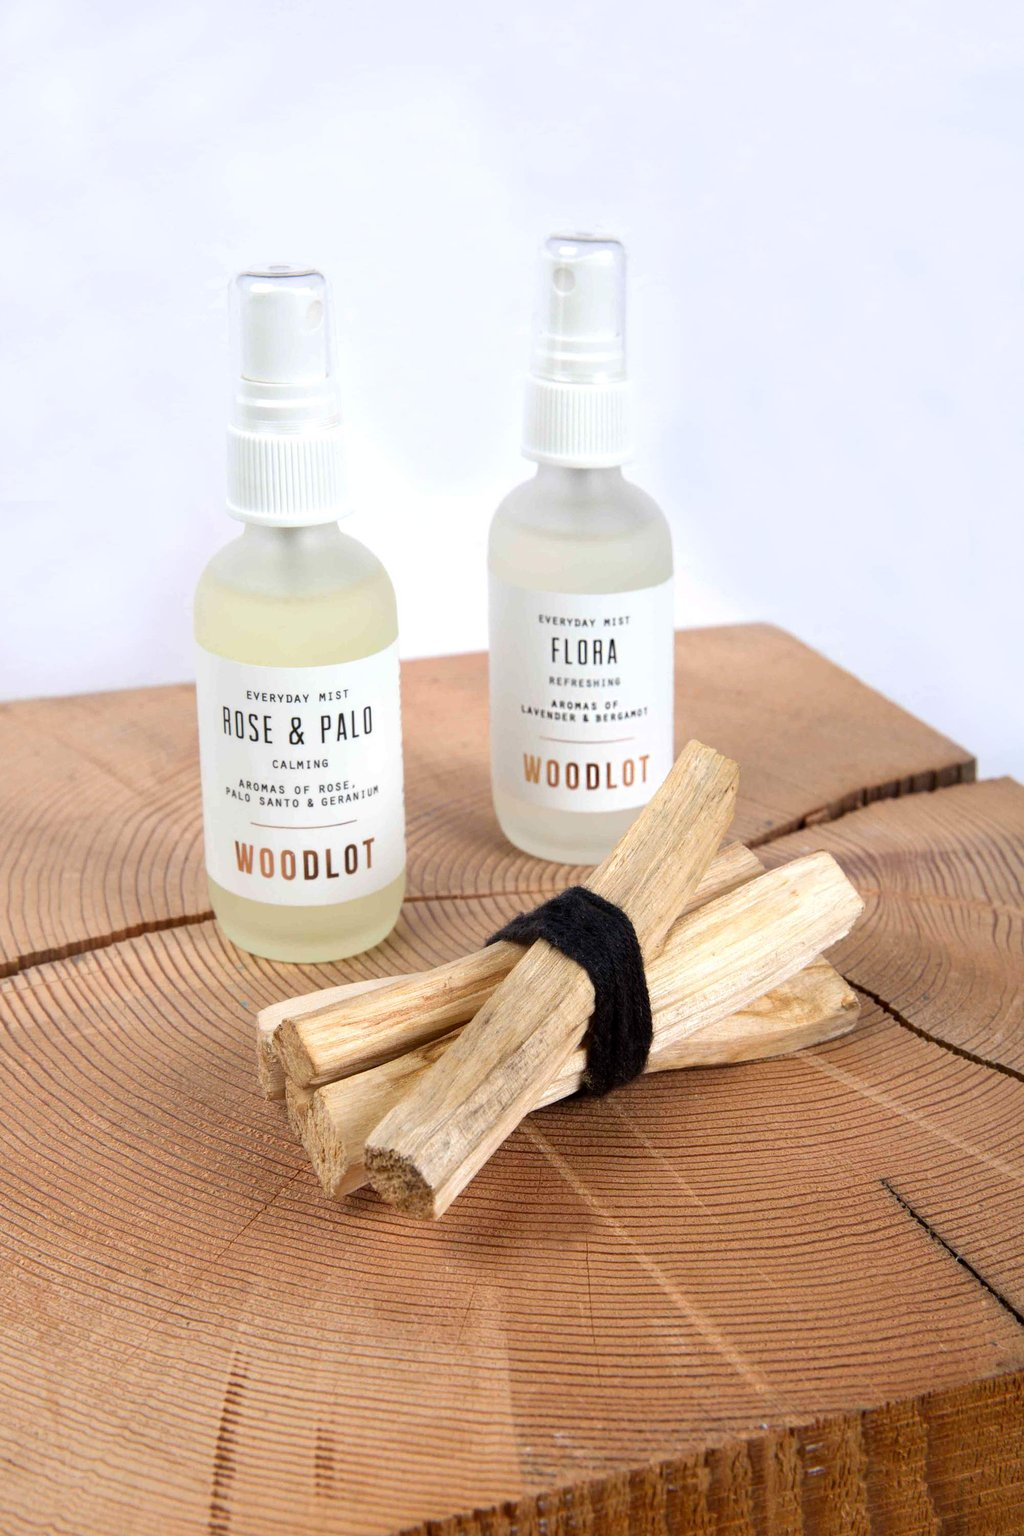 Woodlot Palo Santo Incense Brown 3